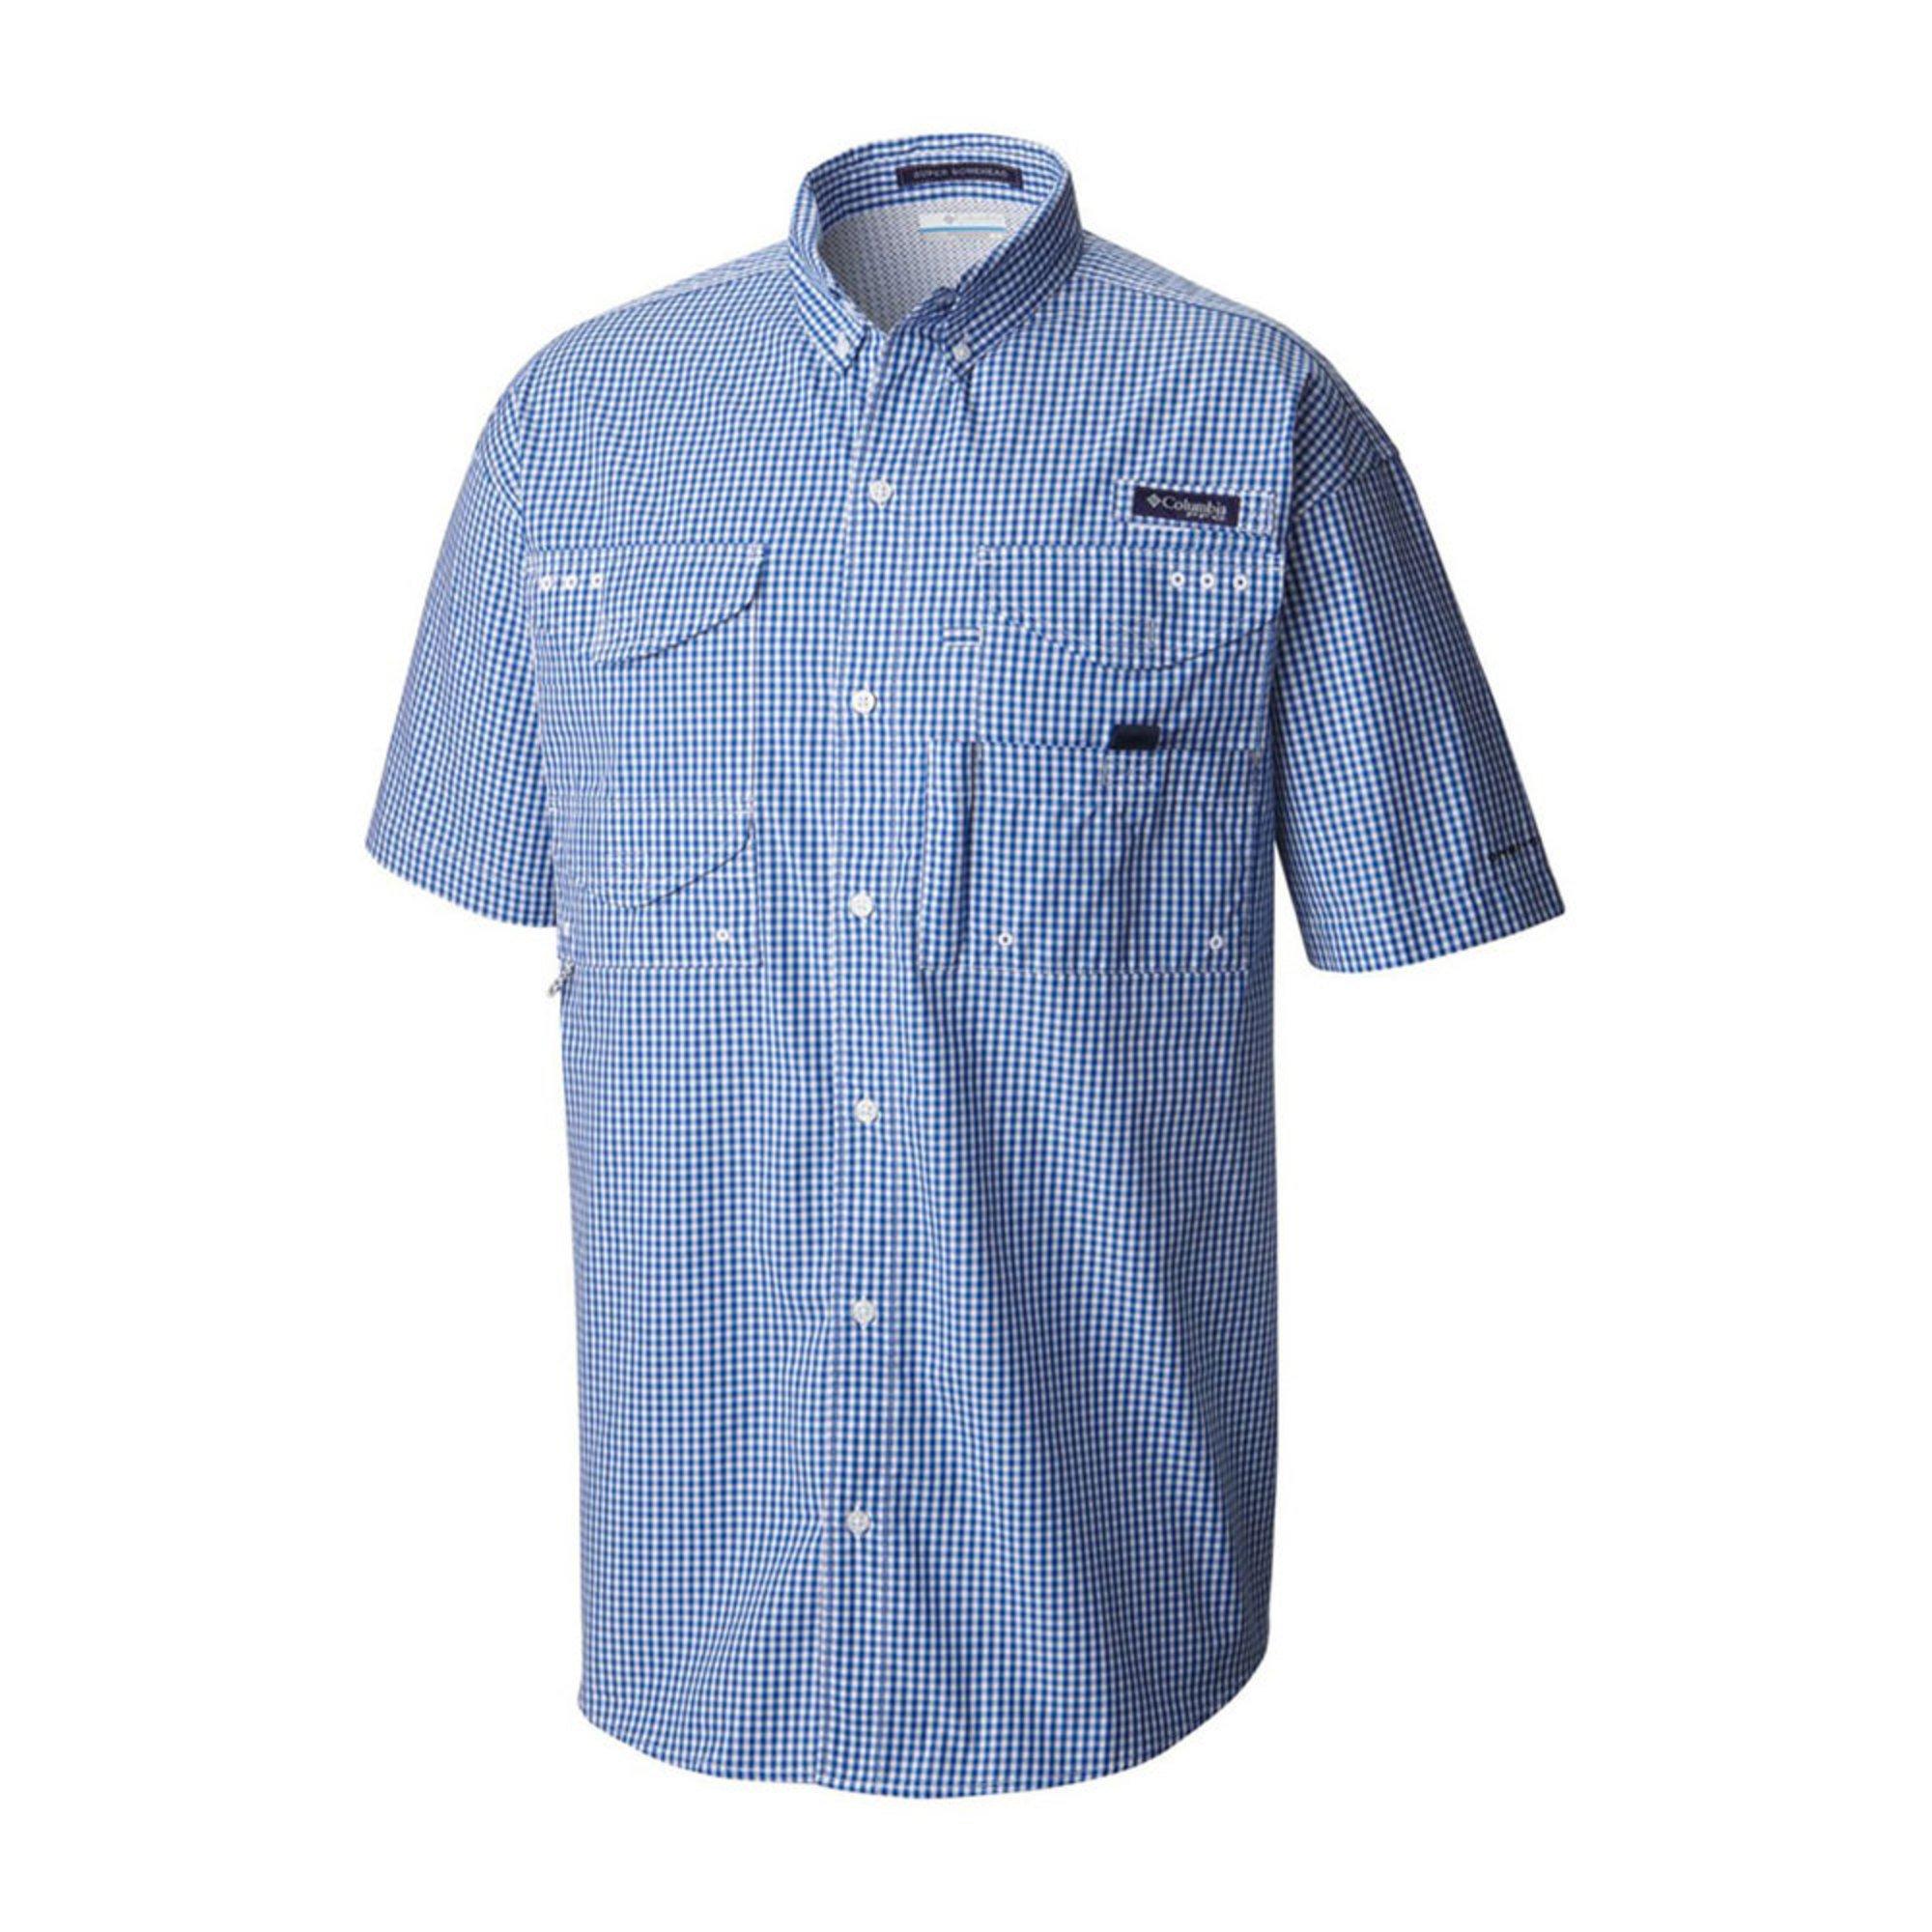 9577758a822 Columbia Men's Pfg Super Bonehead Classic Shirt   Outdoor Button ...